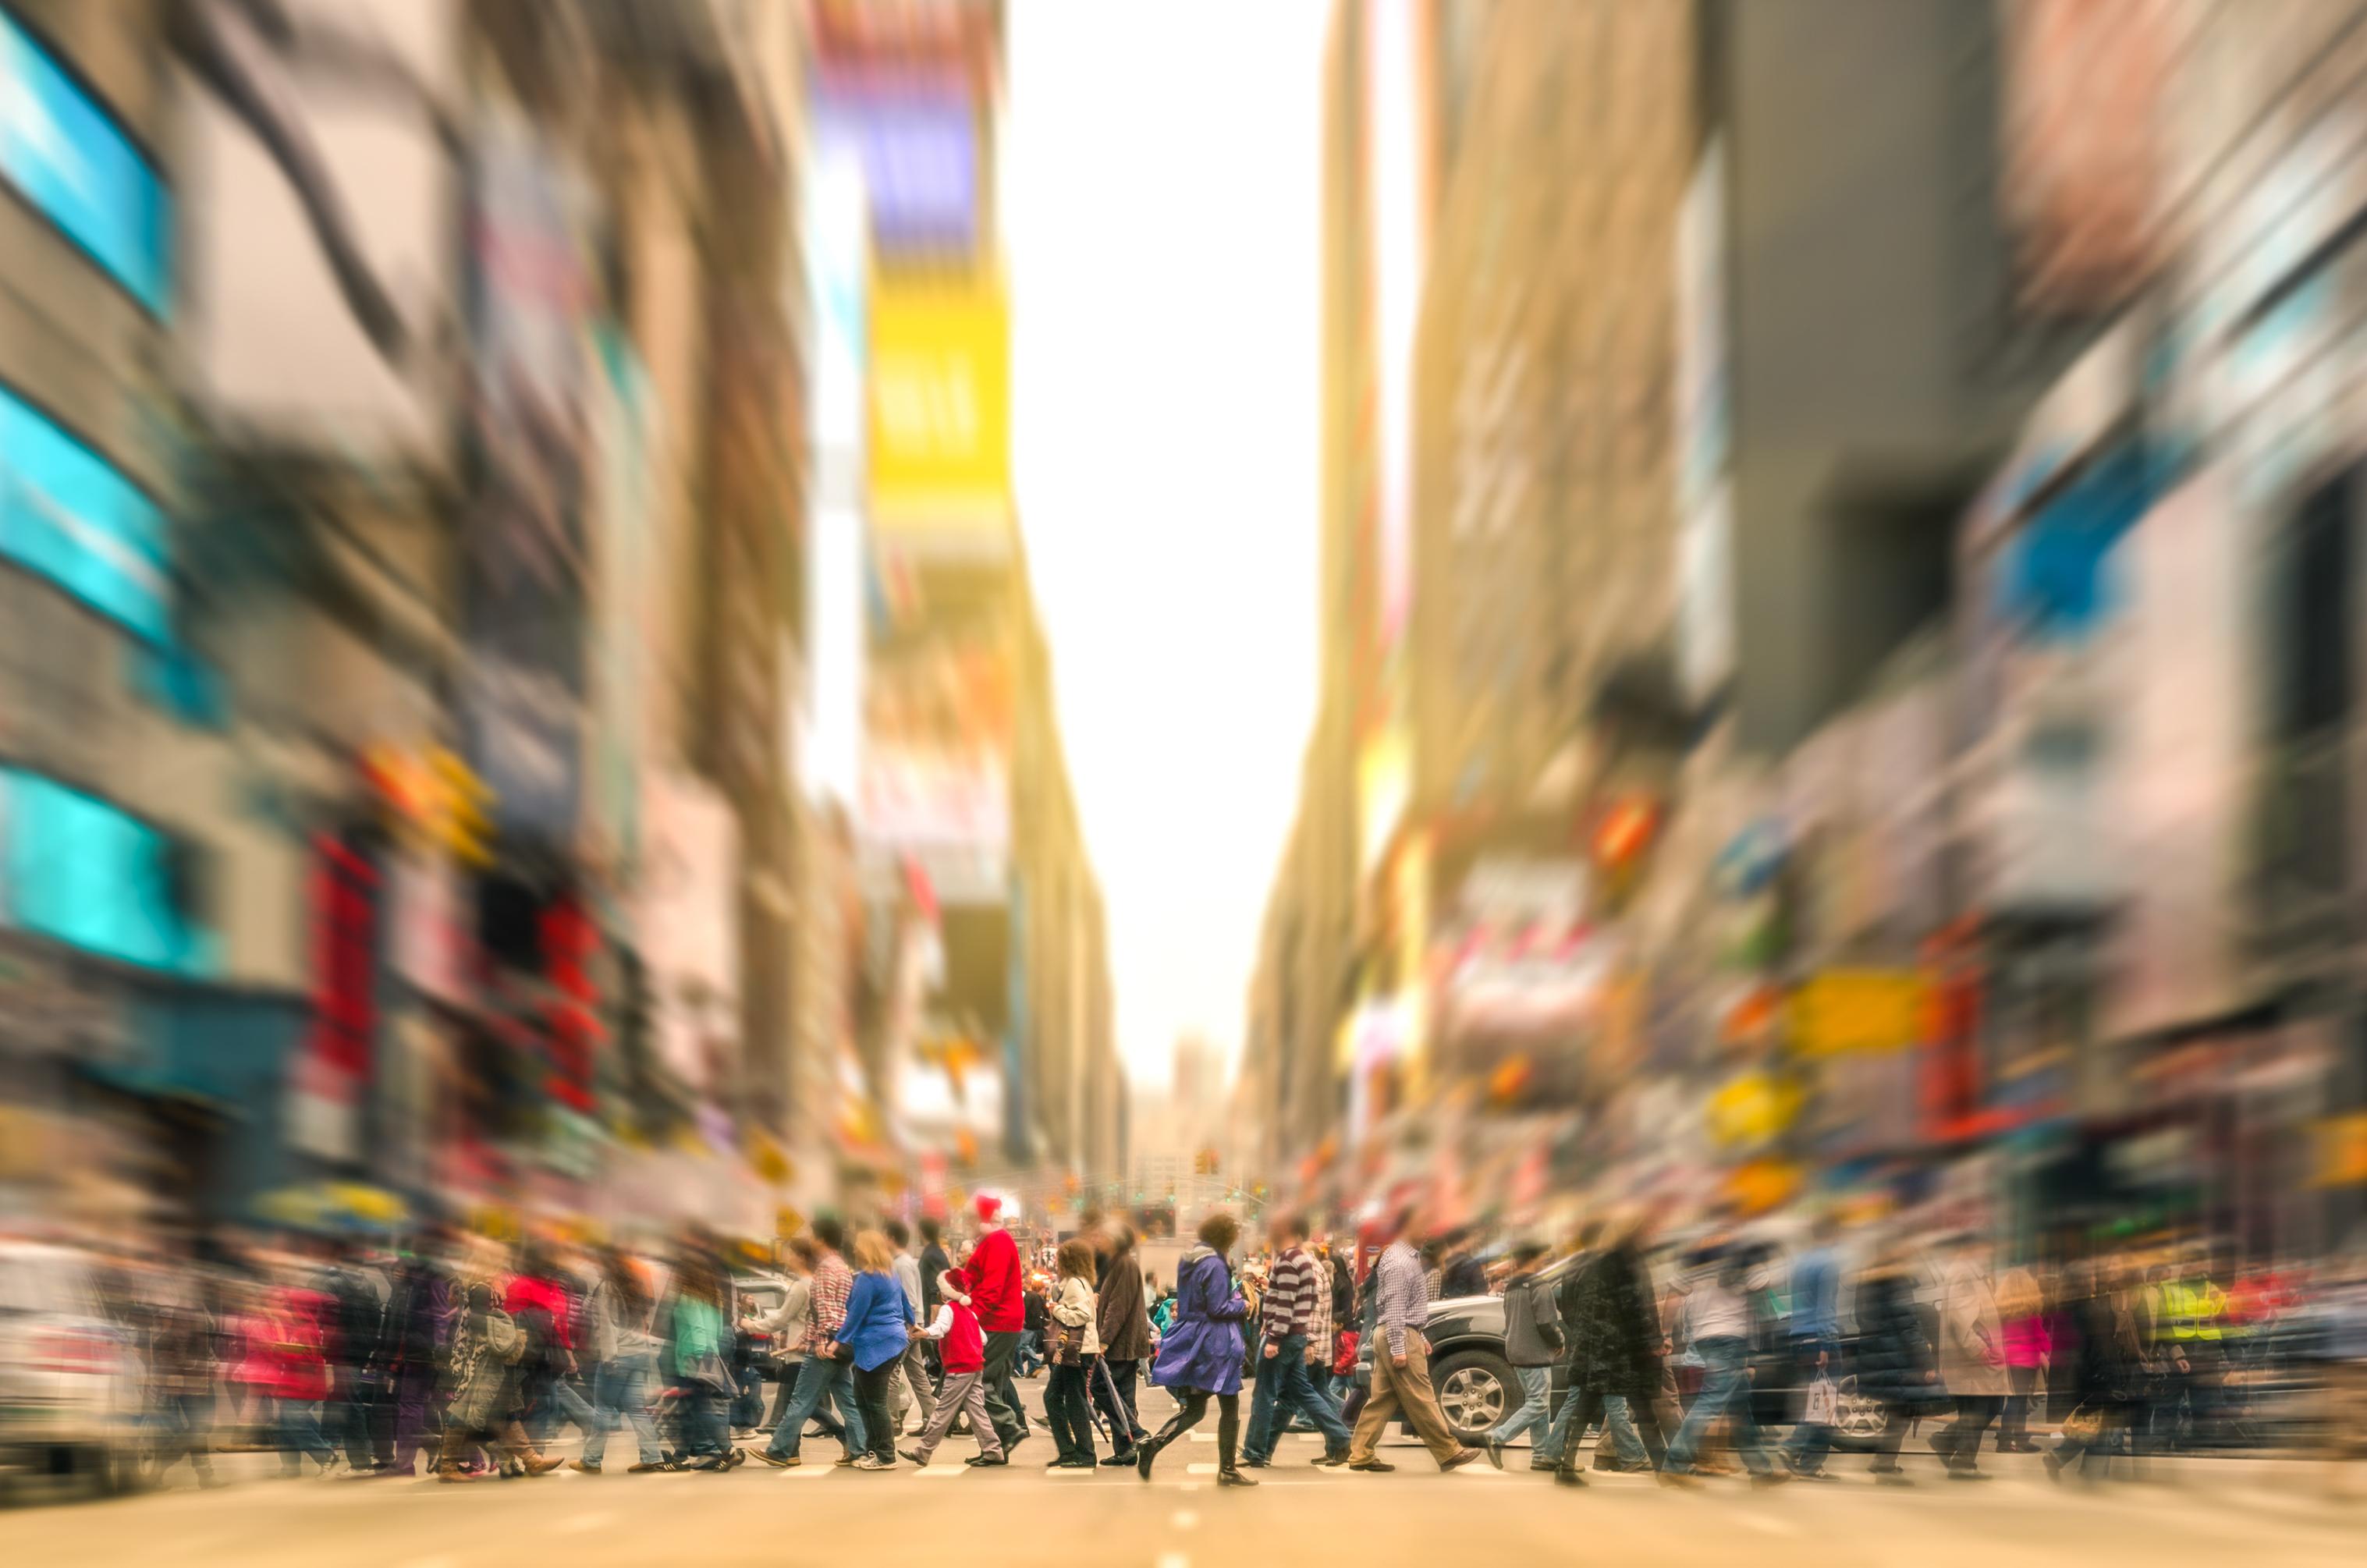 Melting Pot People Walking On Zebra Crossing And Traffic Jam In New York Manhattan At Sunset